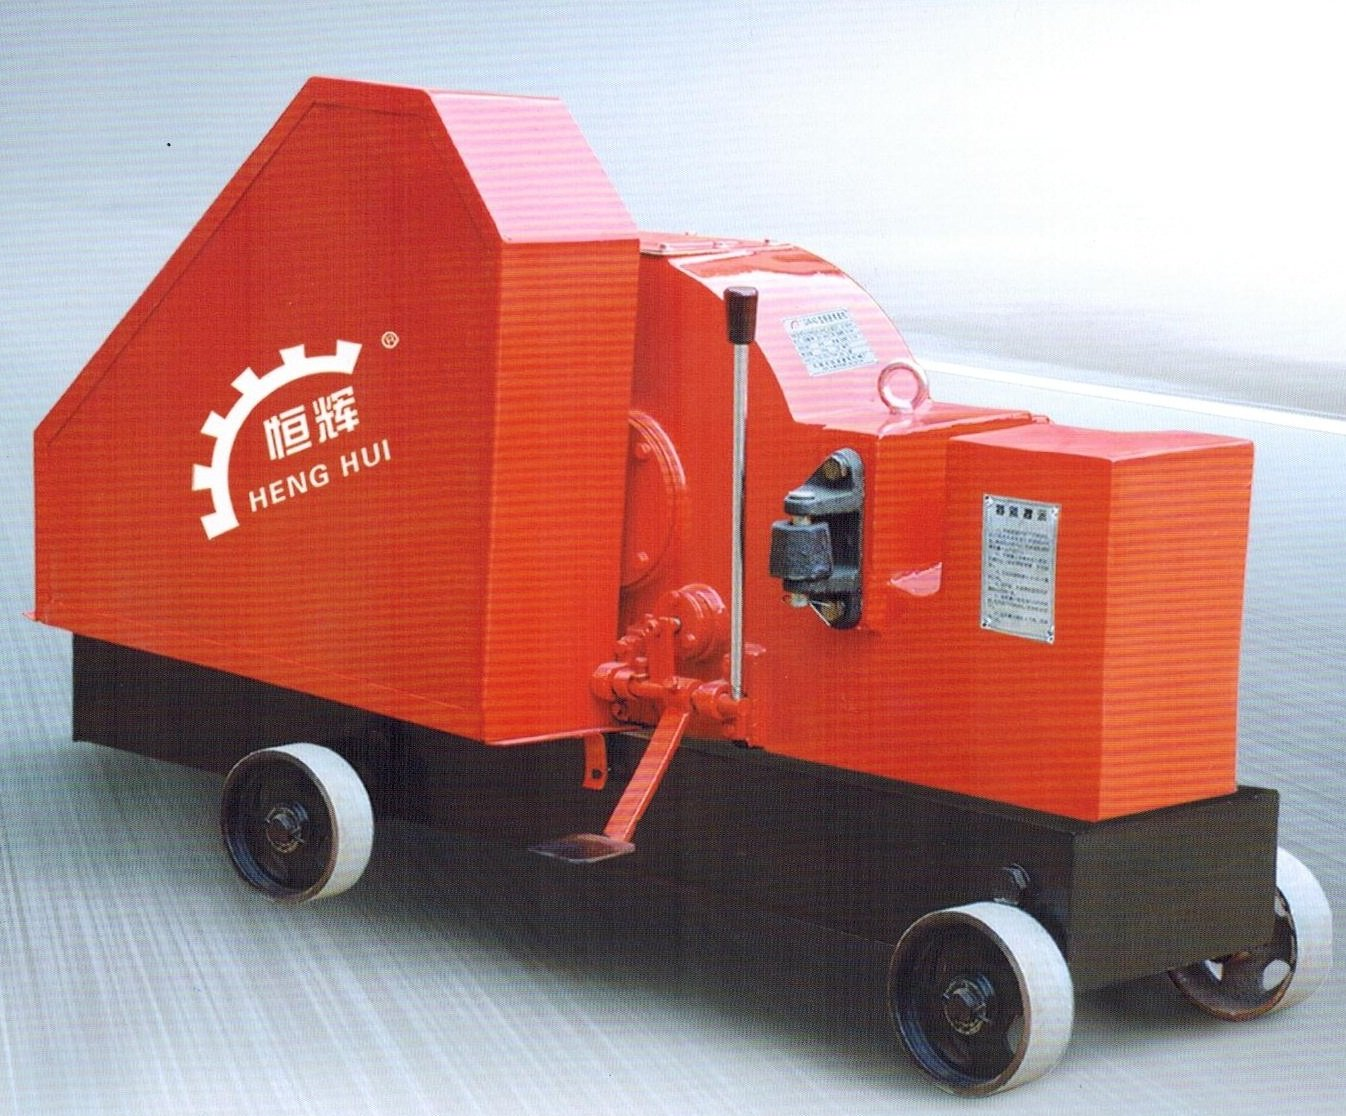 Máy cắt sắt Heng Hui GQ40C